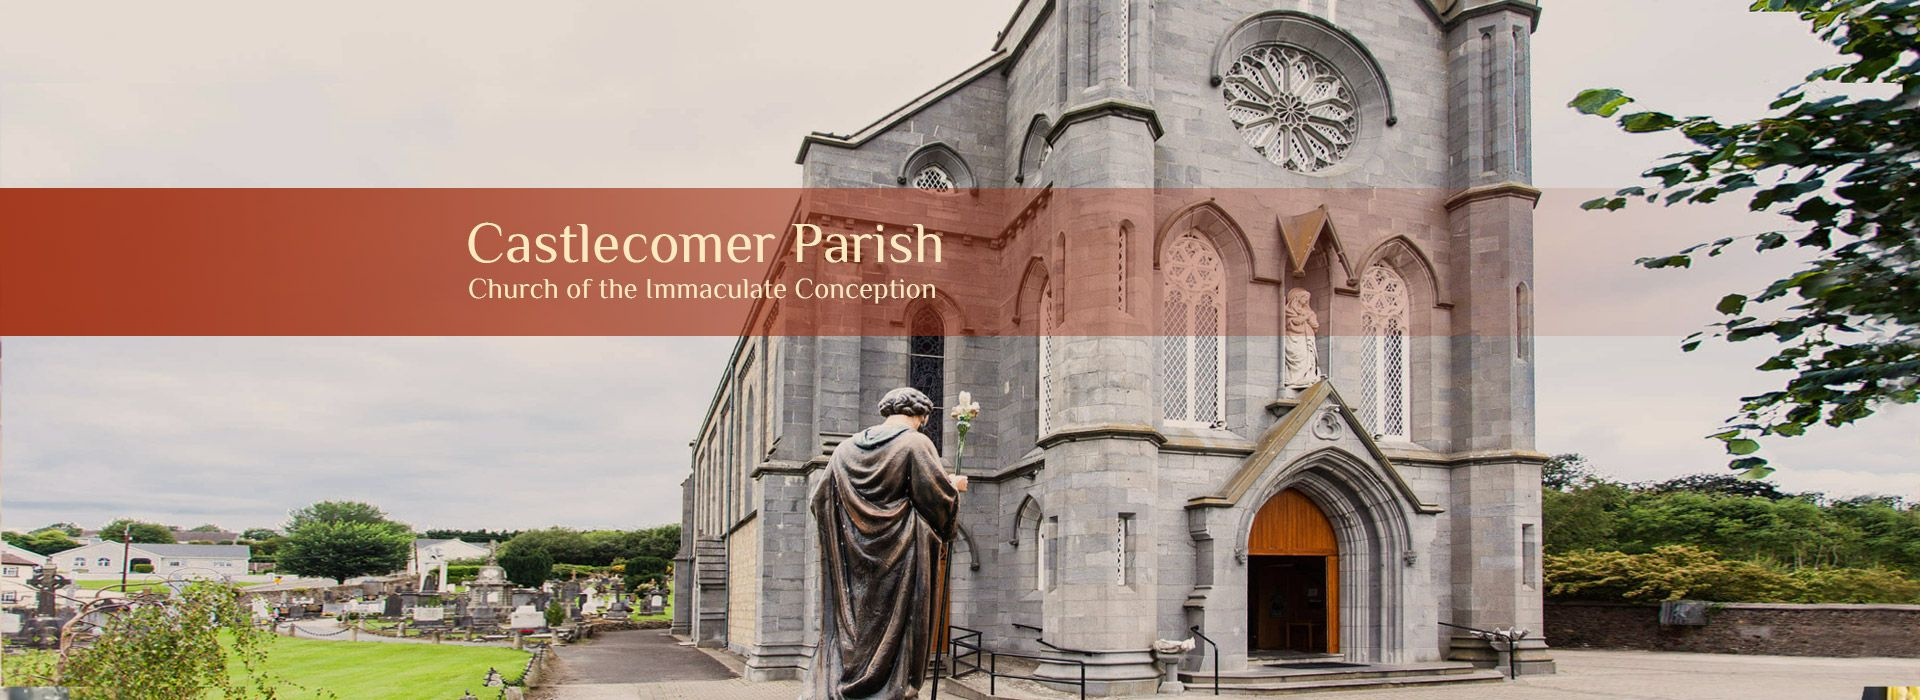 Castlecomer Parish